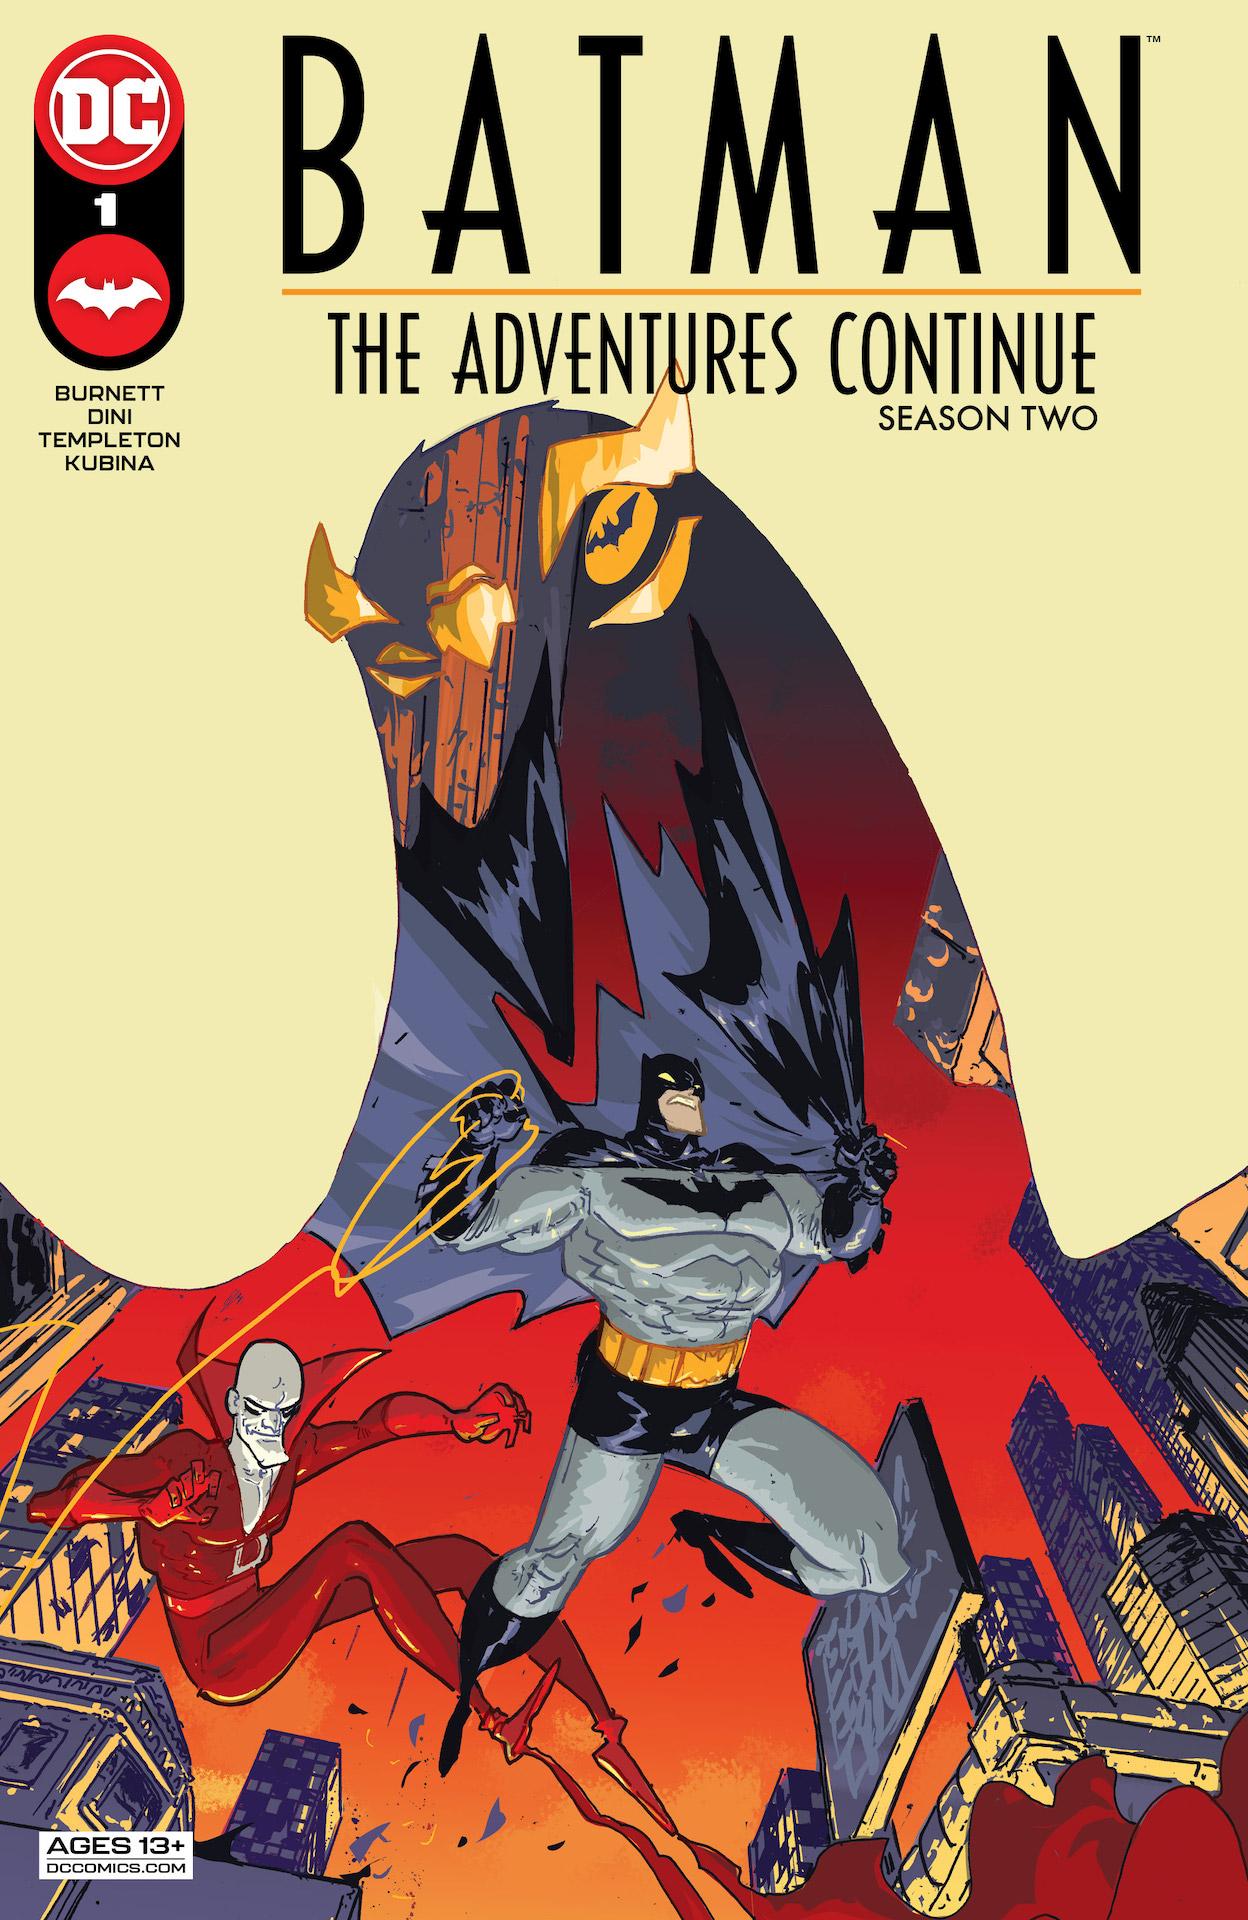 Batman-The-Adventures-Continue-Season-Two-1-1